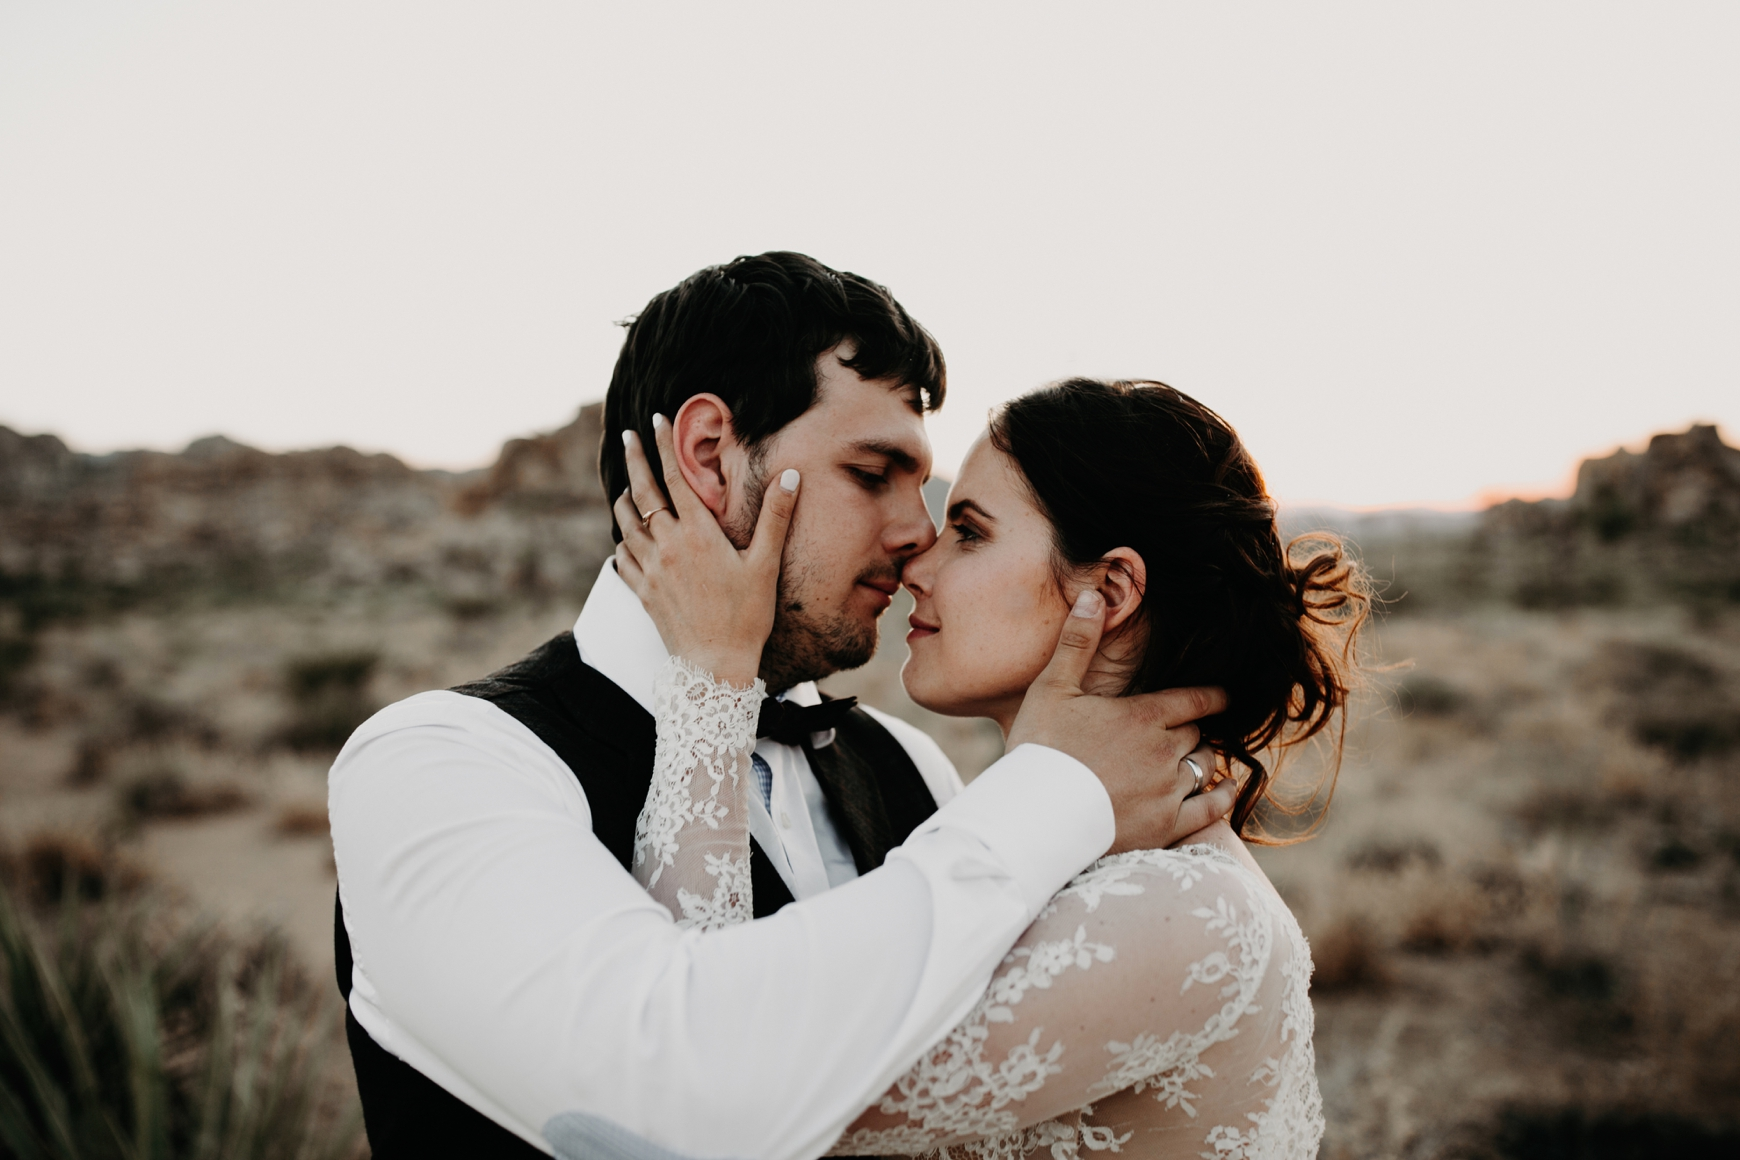 Joshua Tree Bridal Portraits Anastasia & Andrey Emily Magers Photography-375.jpg